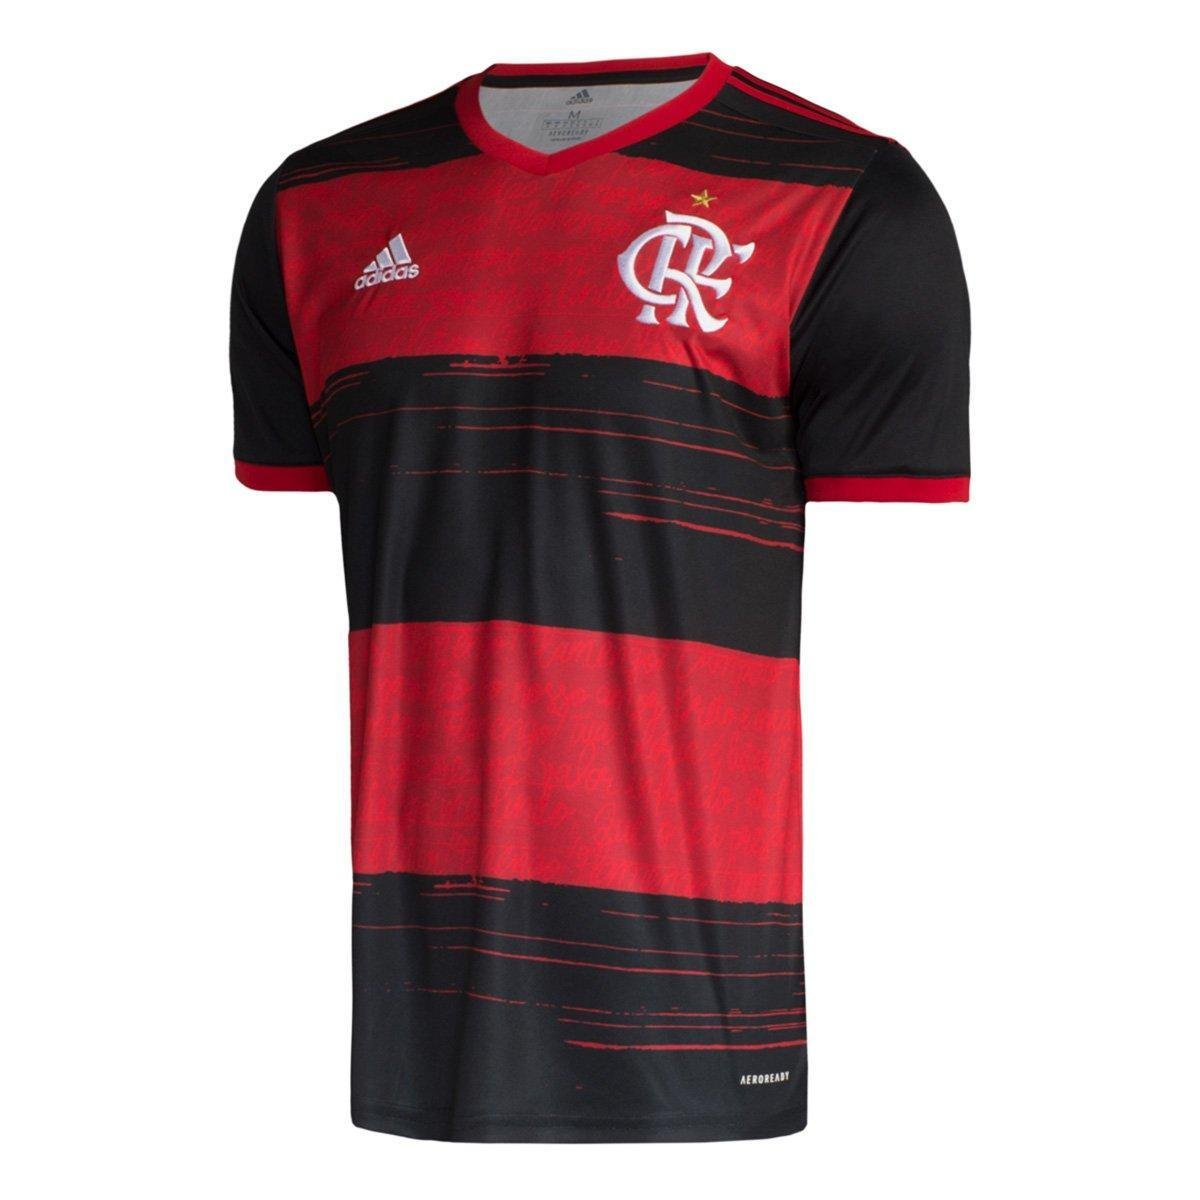 Camisa Flamengo I 20/21 s/n° Torcedor Adidas Masculina - Tam: G